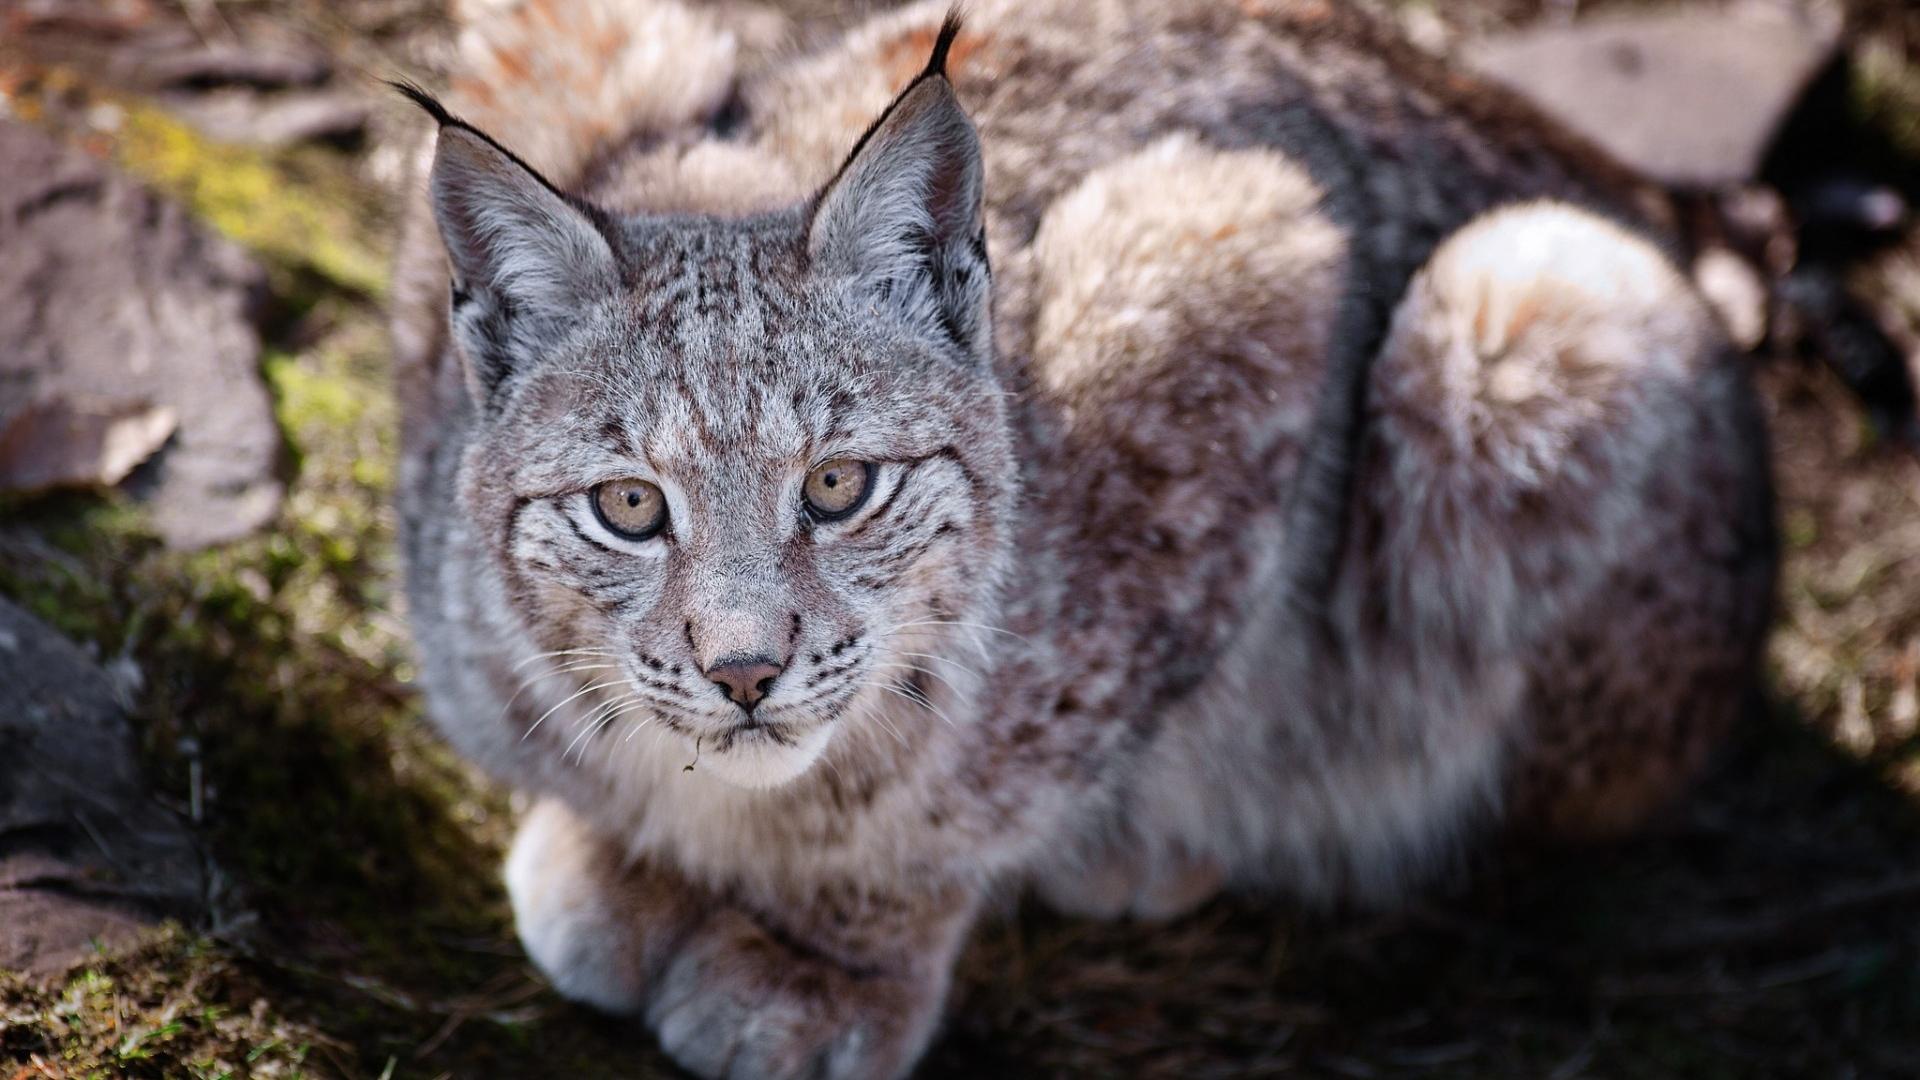 download wallpaper 1920x1080 big cat, predator, lie, lynx full hd